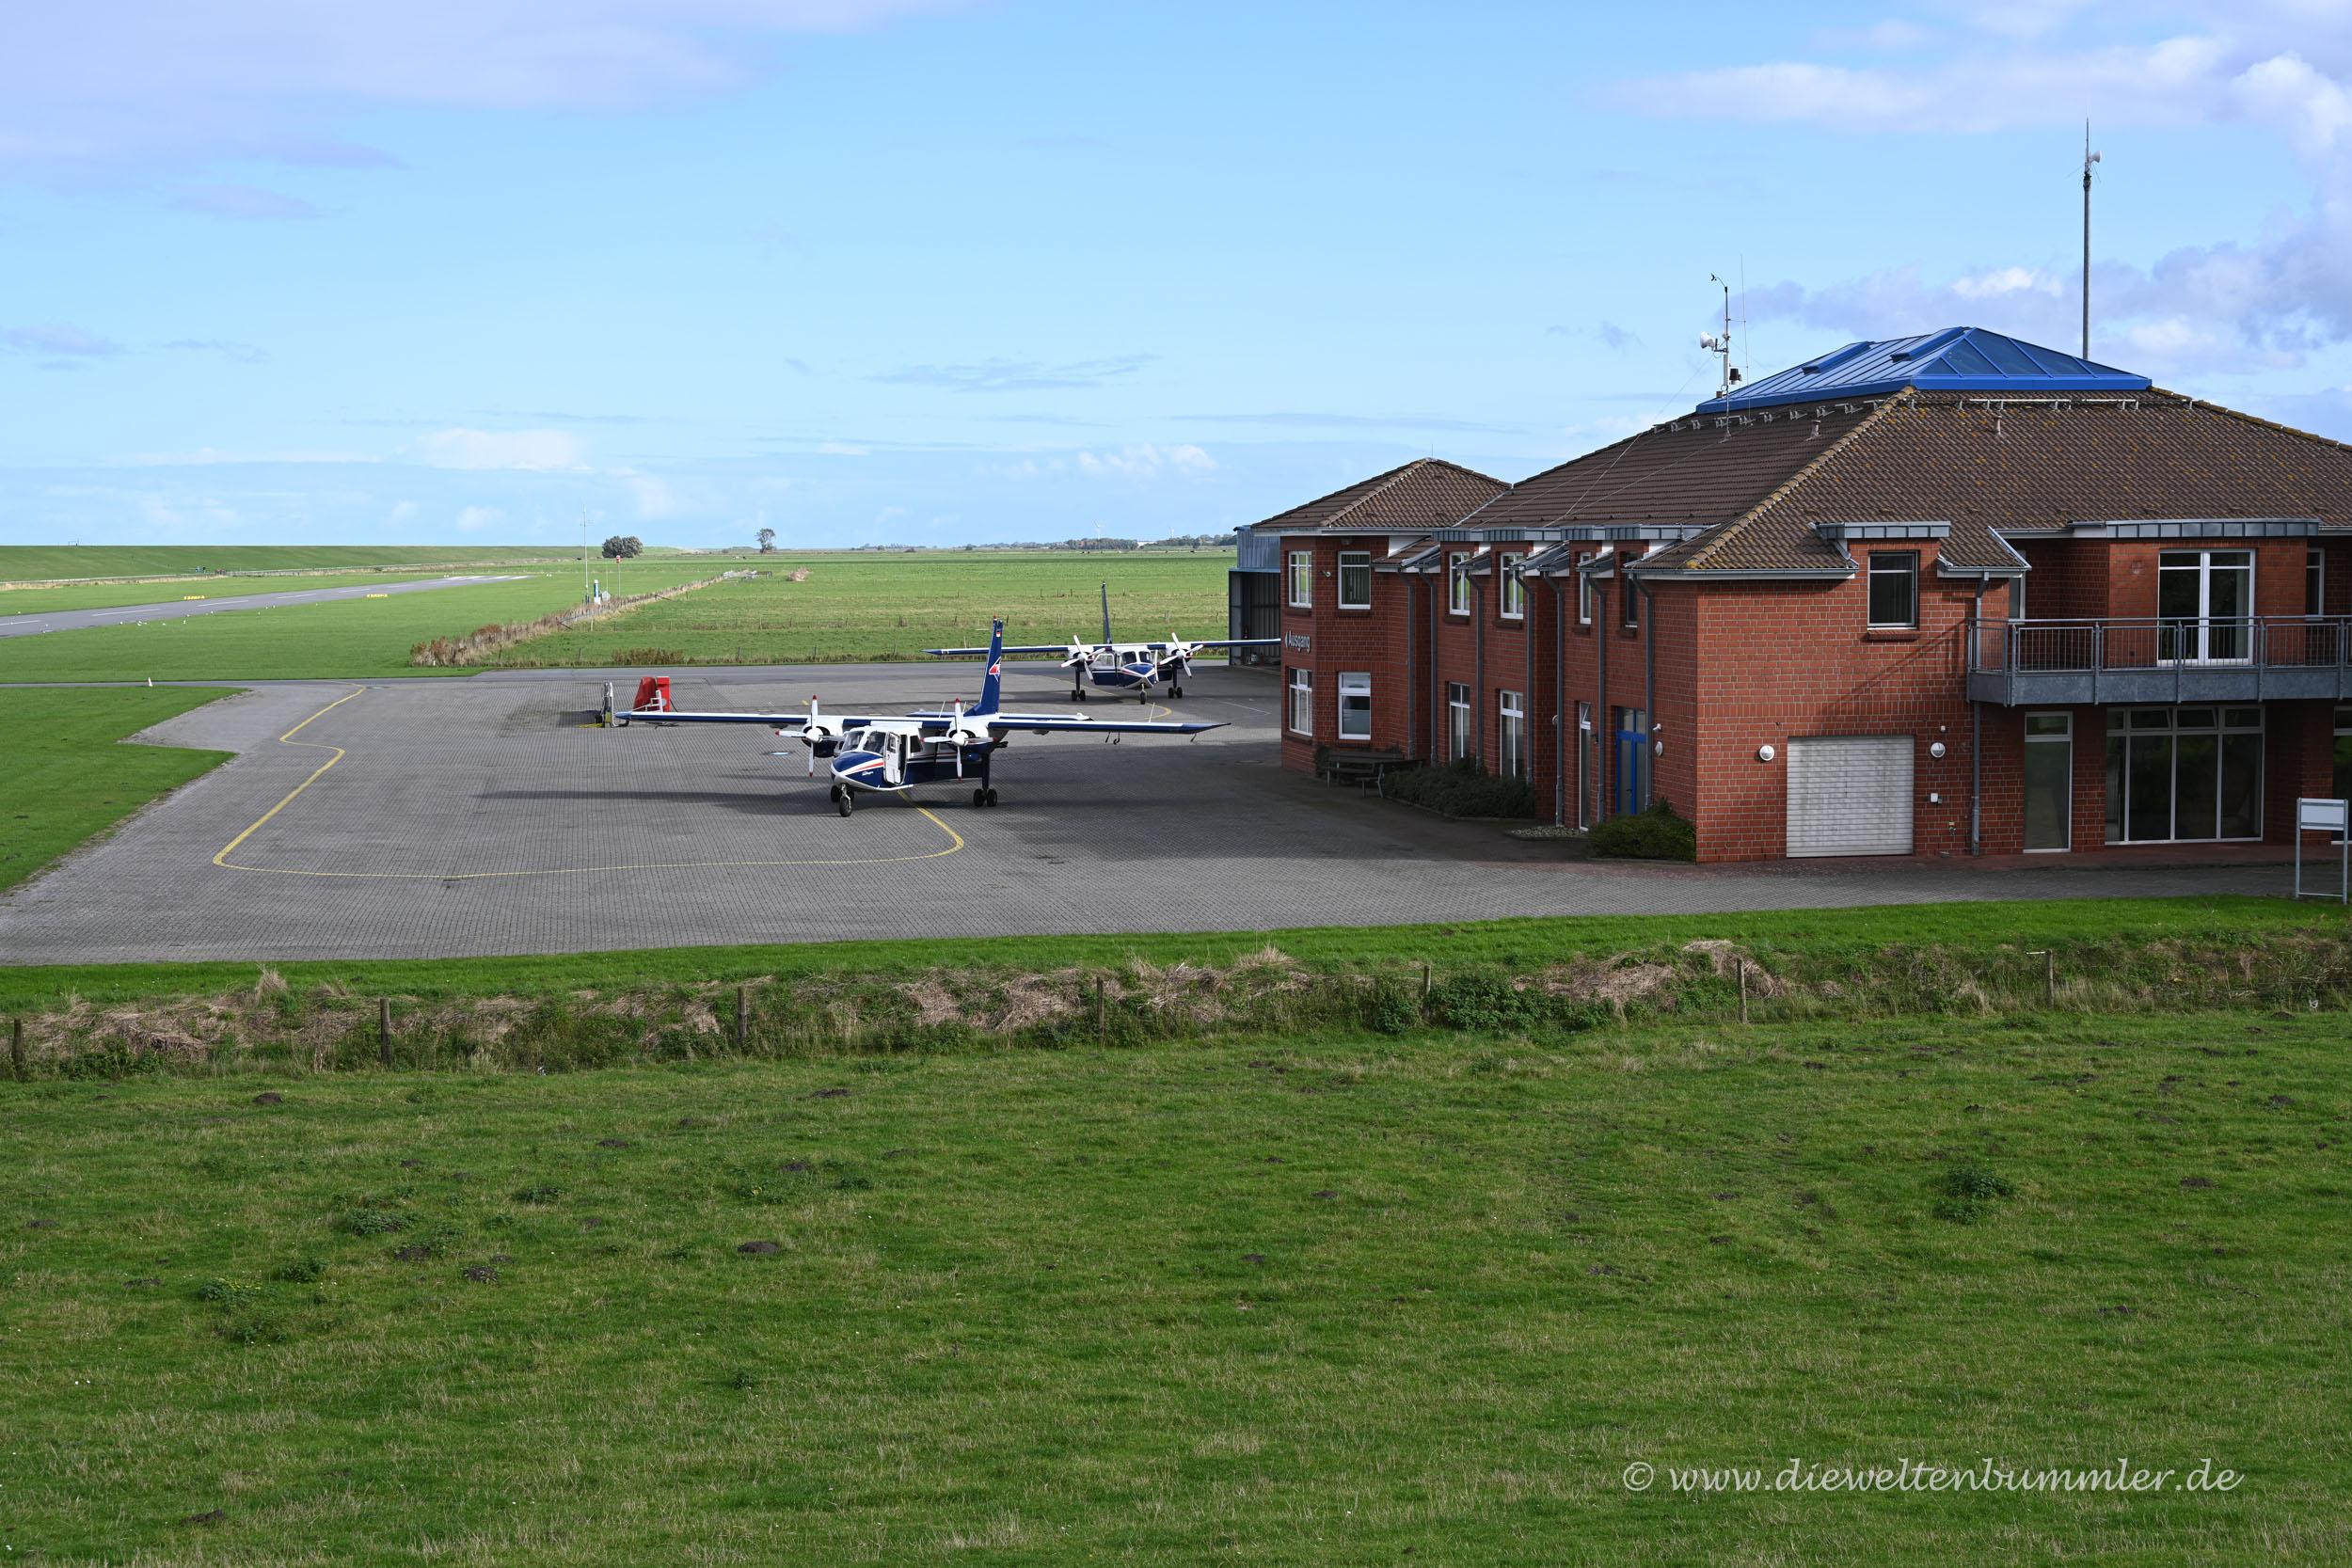 Flugplatz Harlesiel